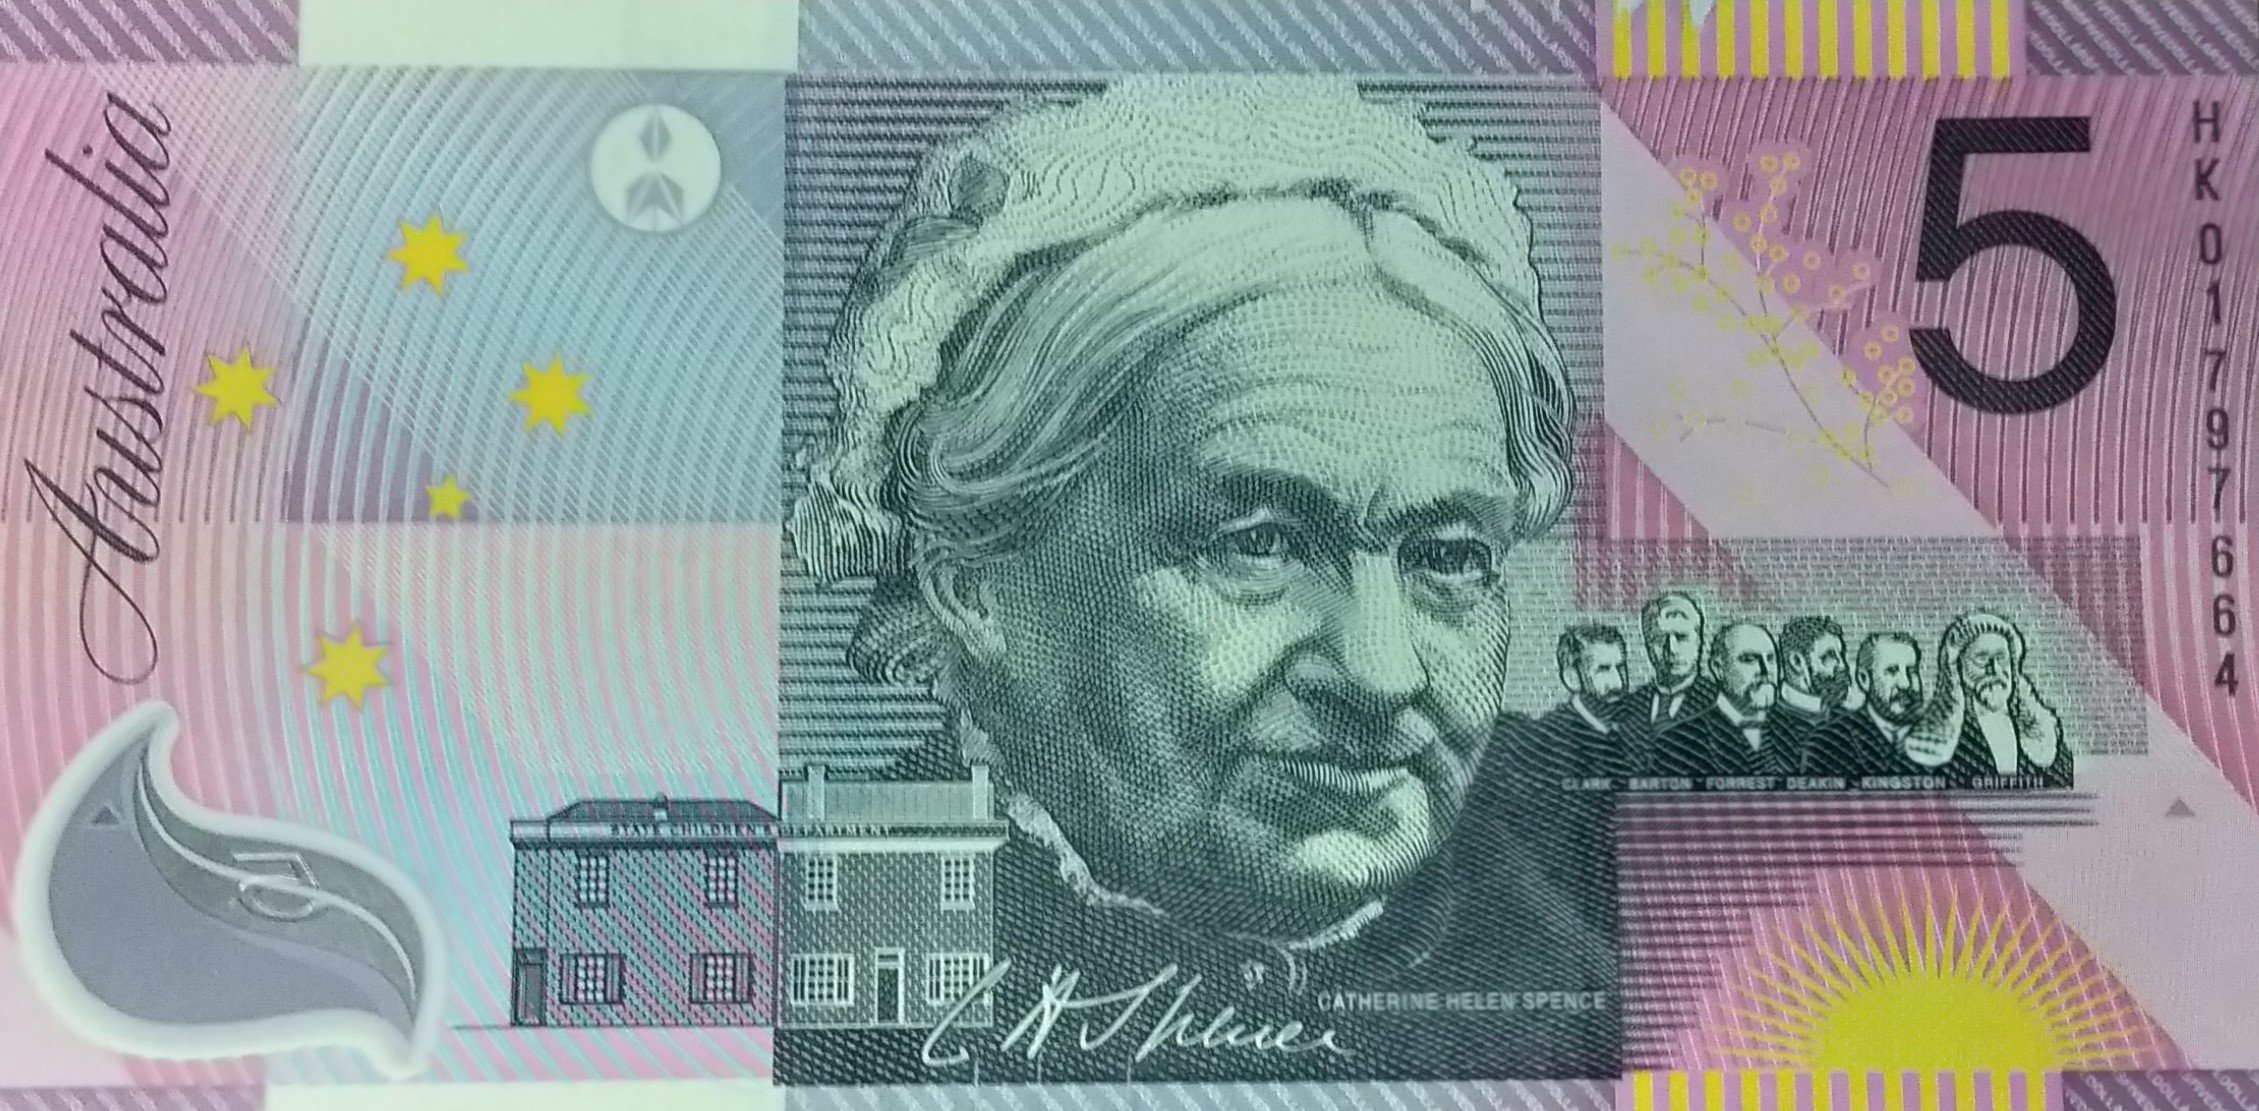 Australia 5 dollars millenium banknote for sale